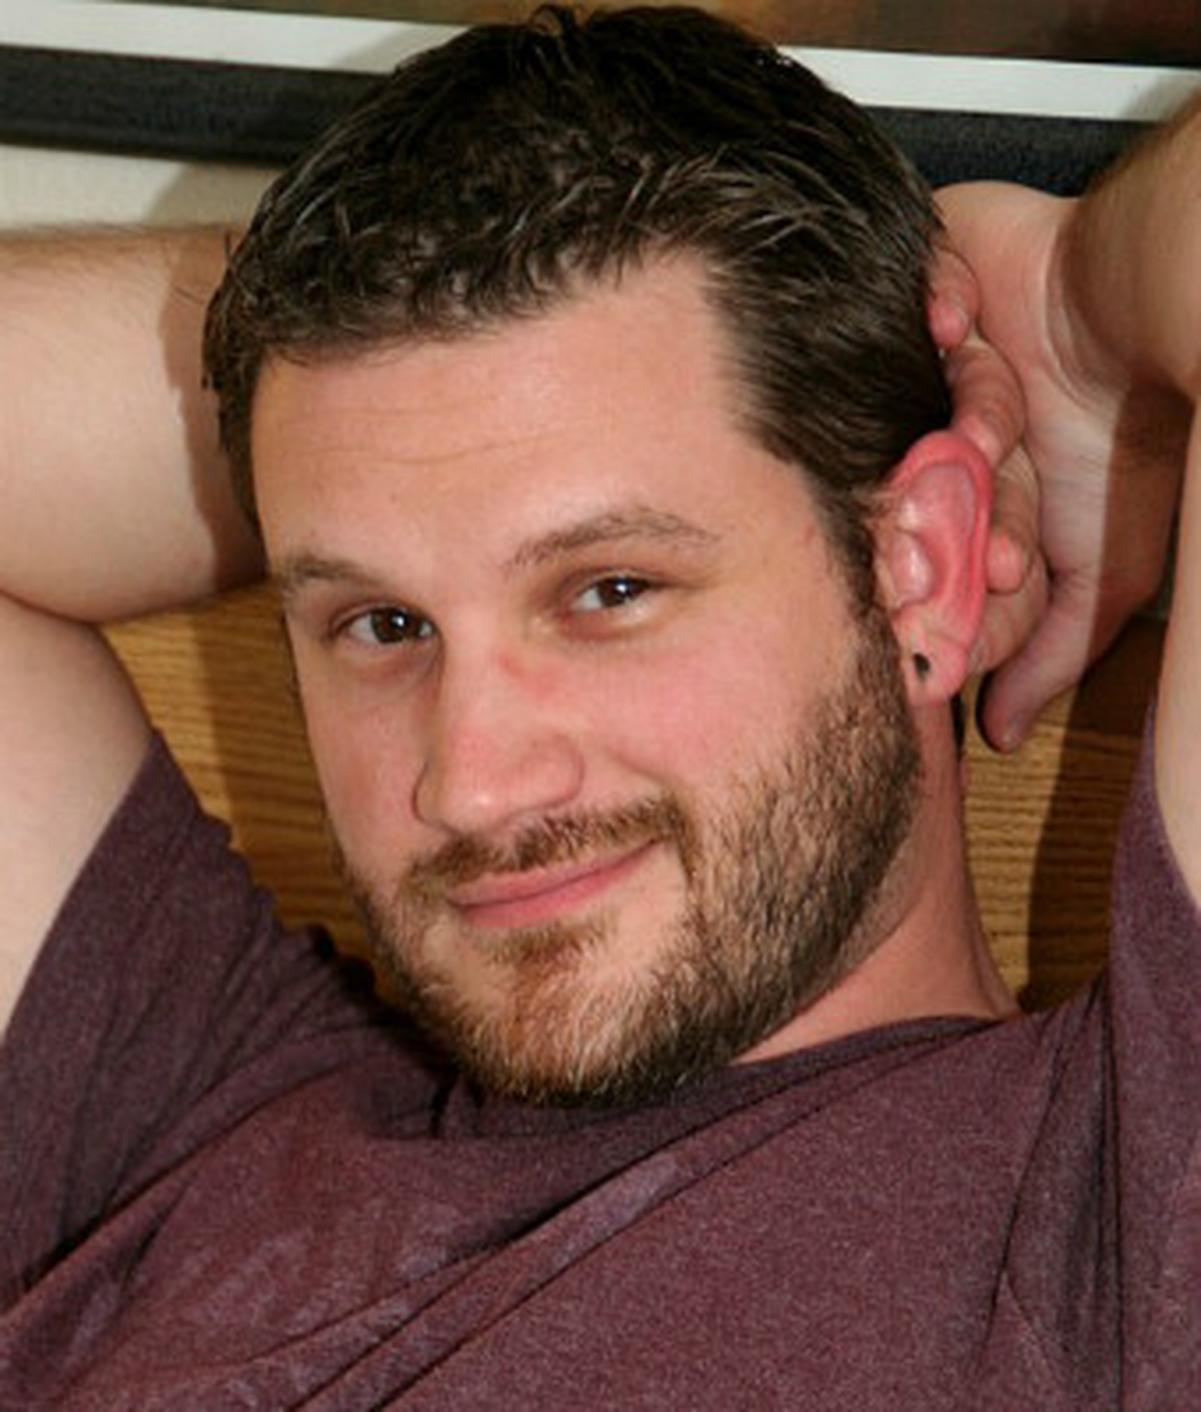 Corey Pierce